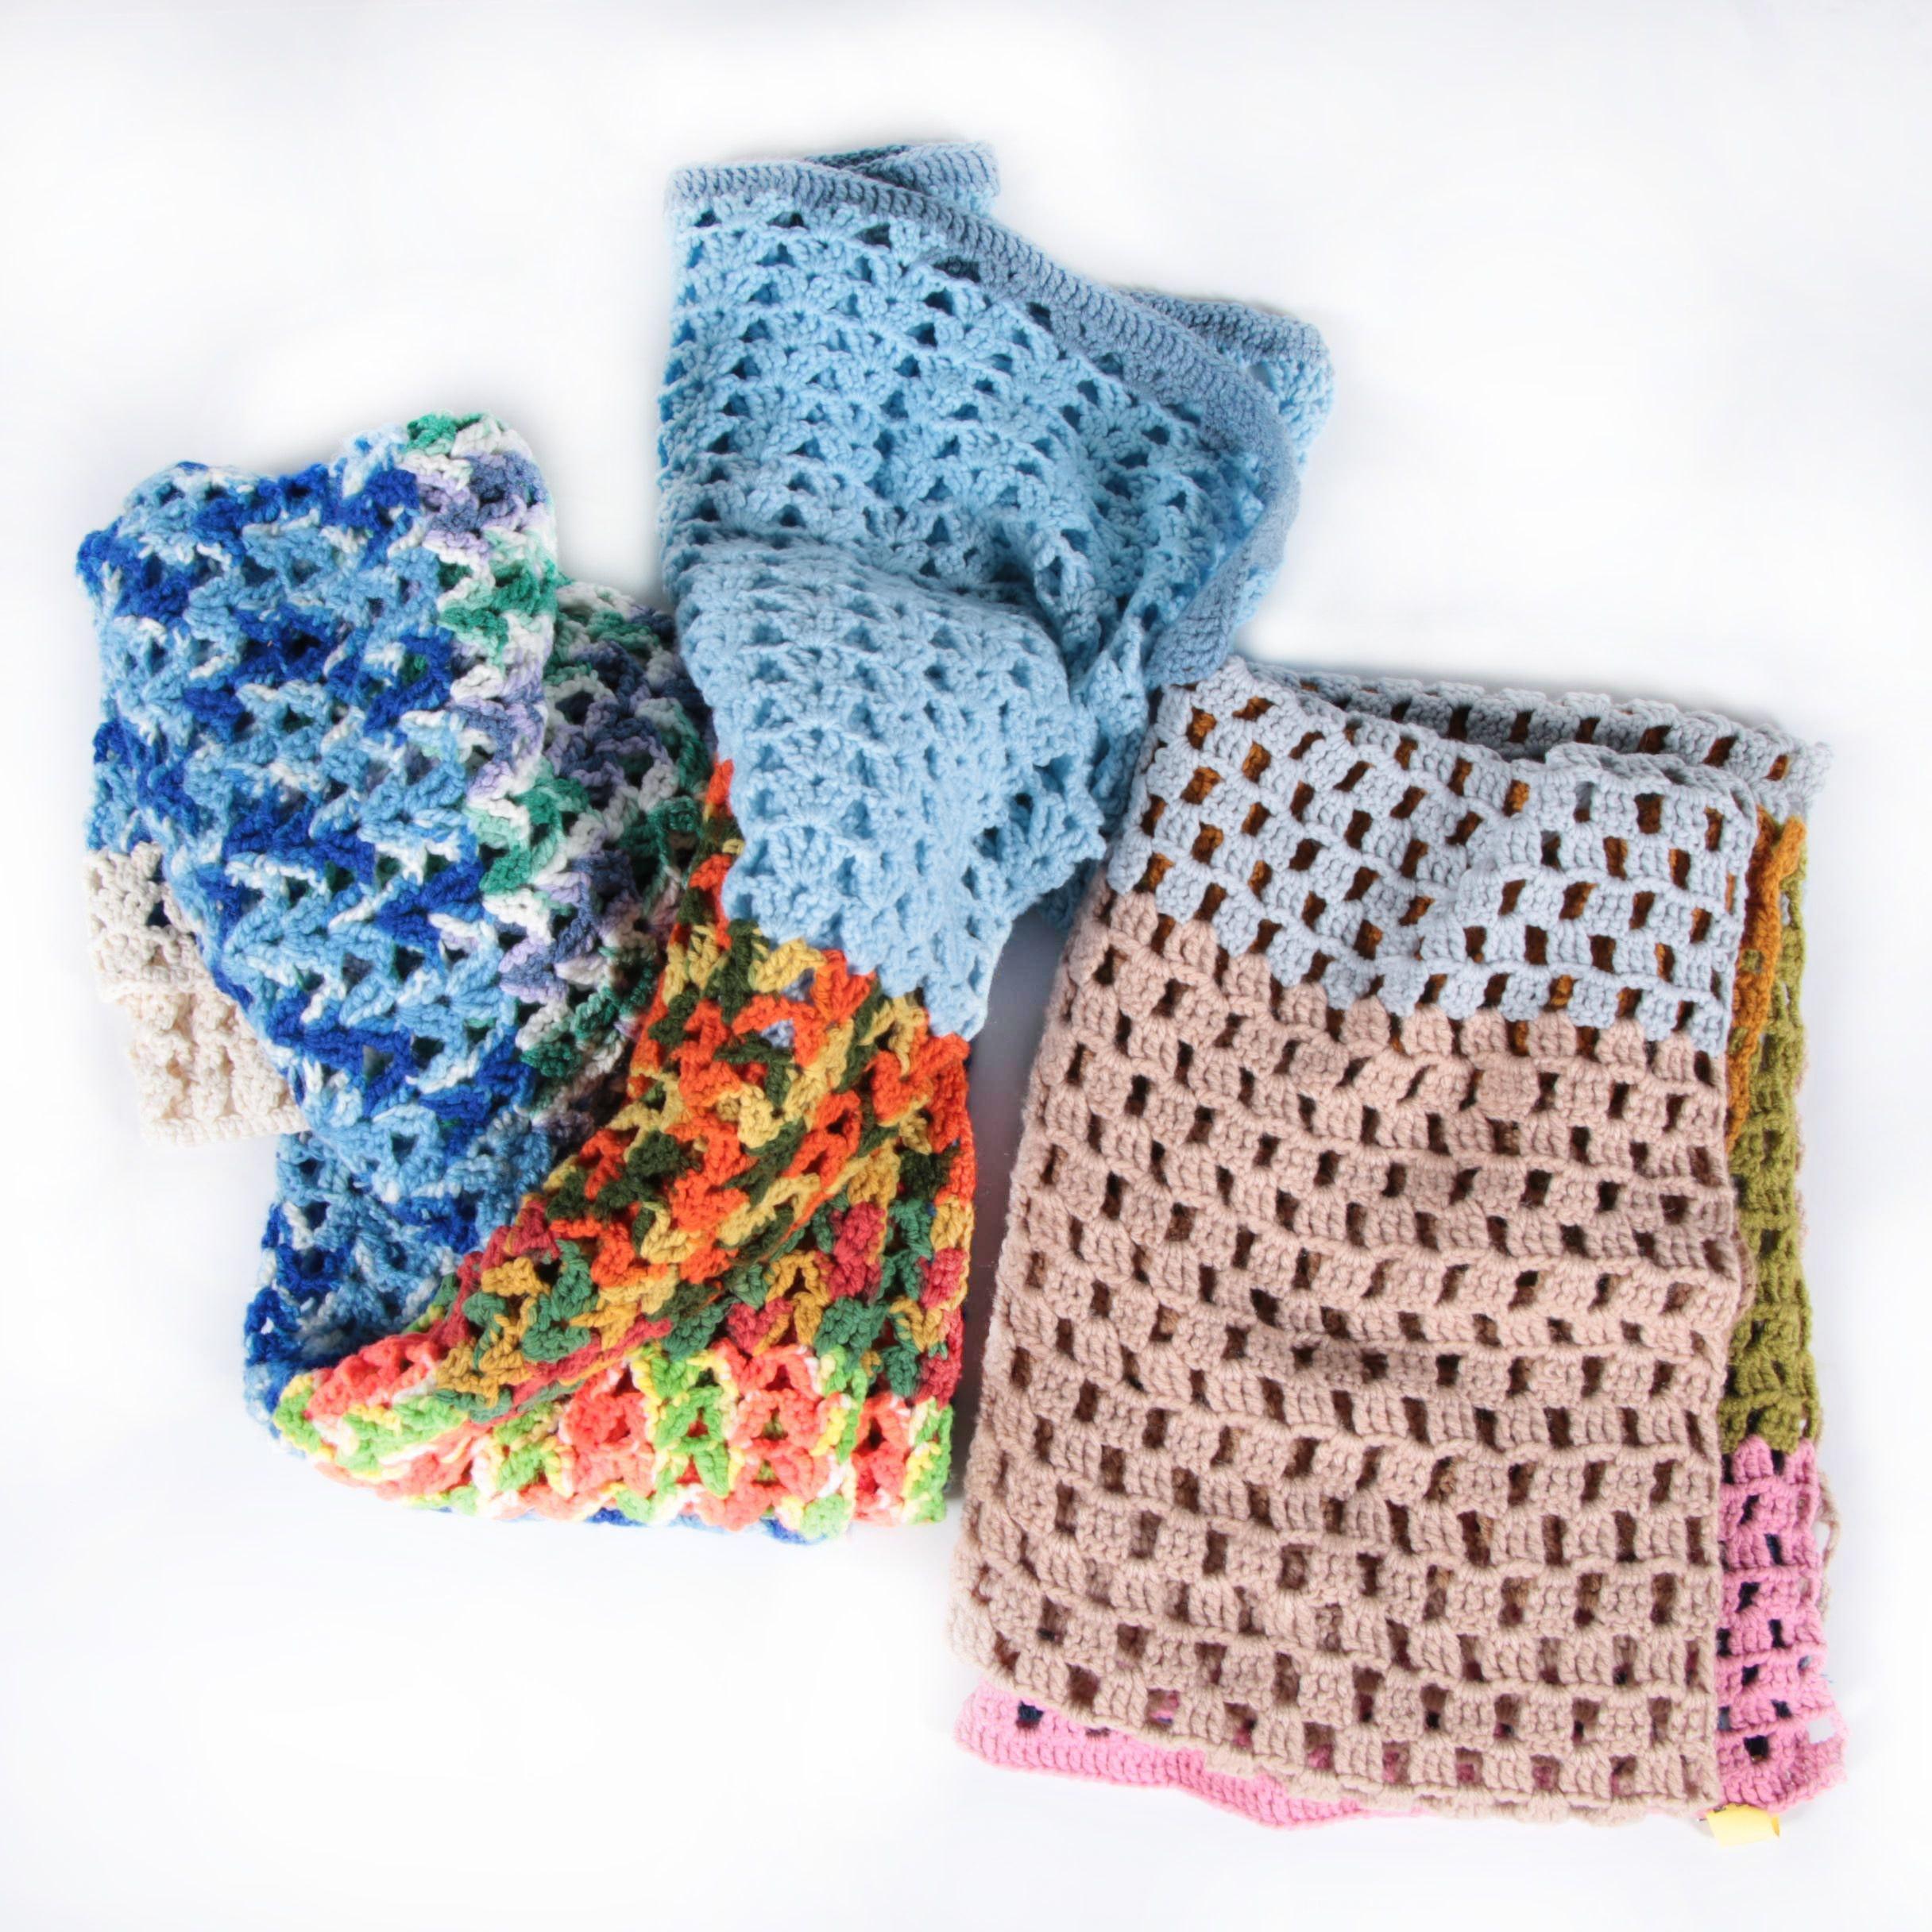 Vintage Hand-Crocheted Afghan Blankets